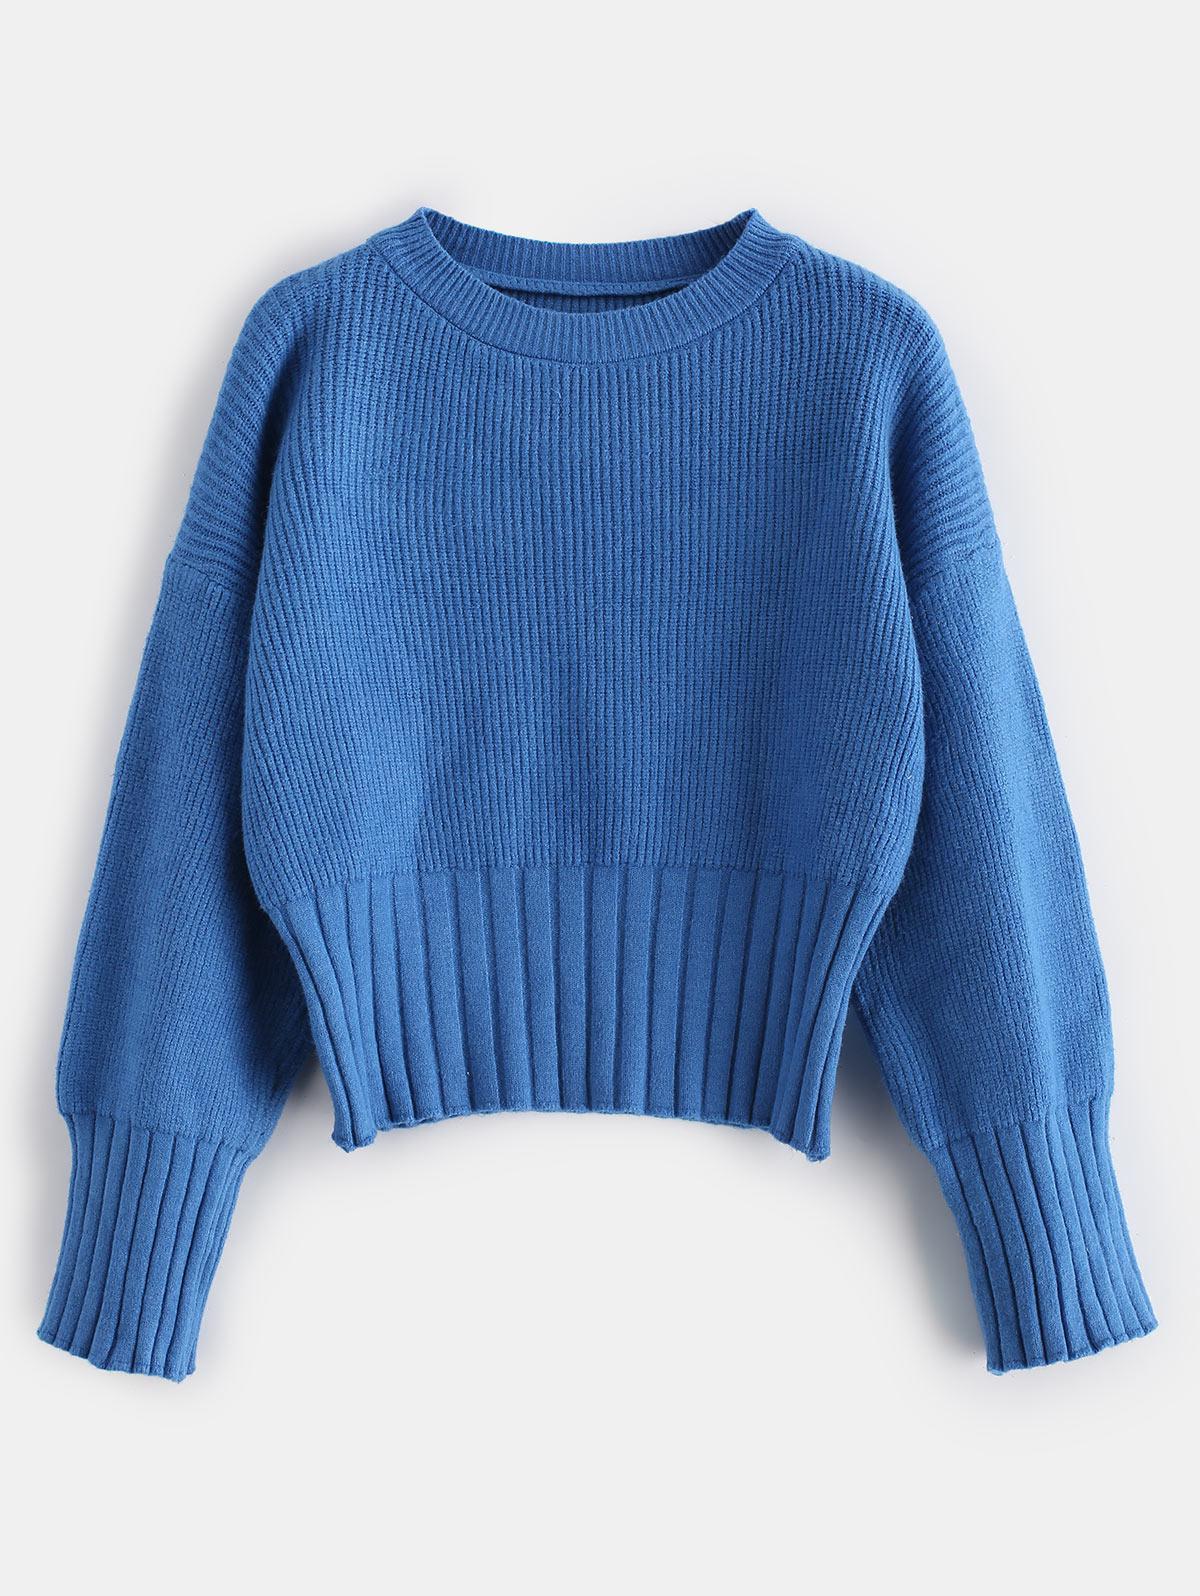 Ribbed Trim Drop Shoulder Sweater 353344301